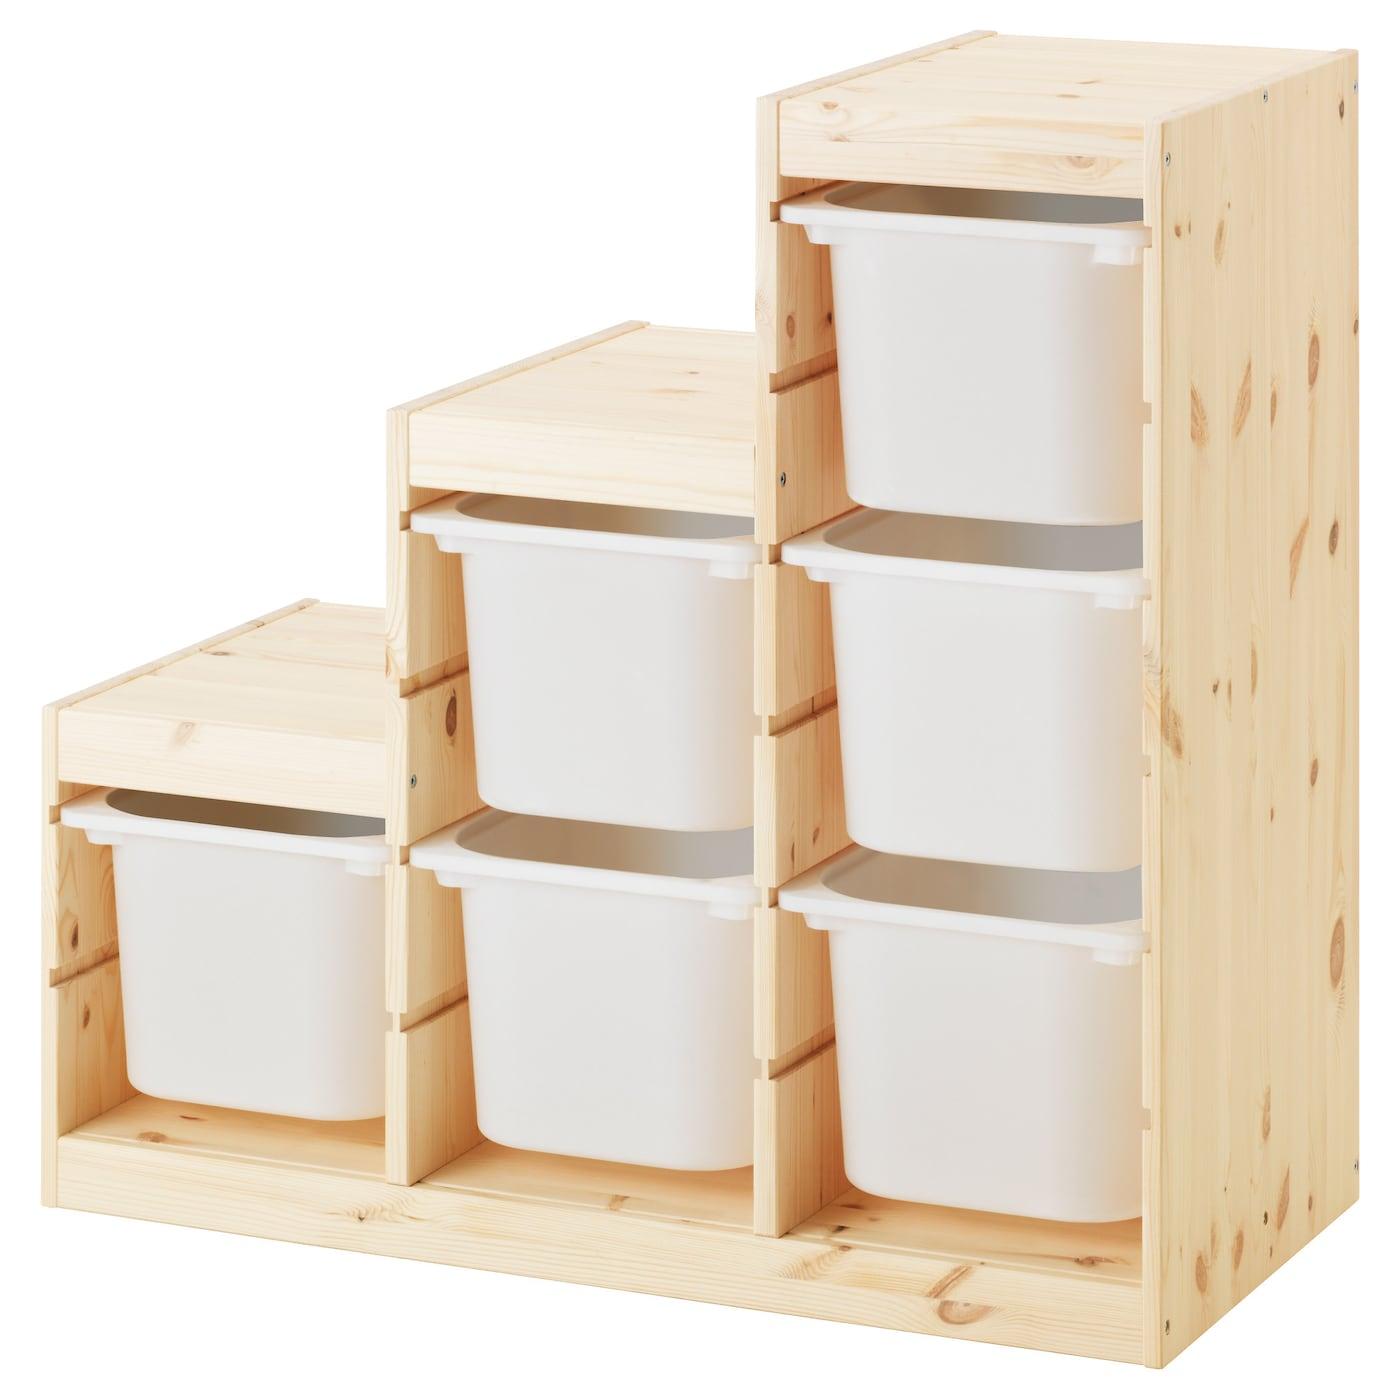 trofast combinaison de rangement pin teint blanc clair blanc 94x44x91 cm ikea. Black Bedroom Furniture Sets. Home Design Ideas